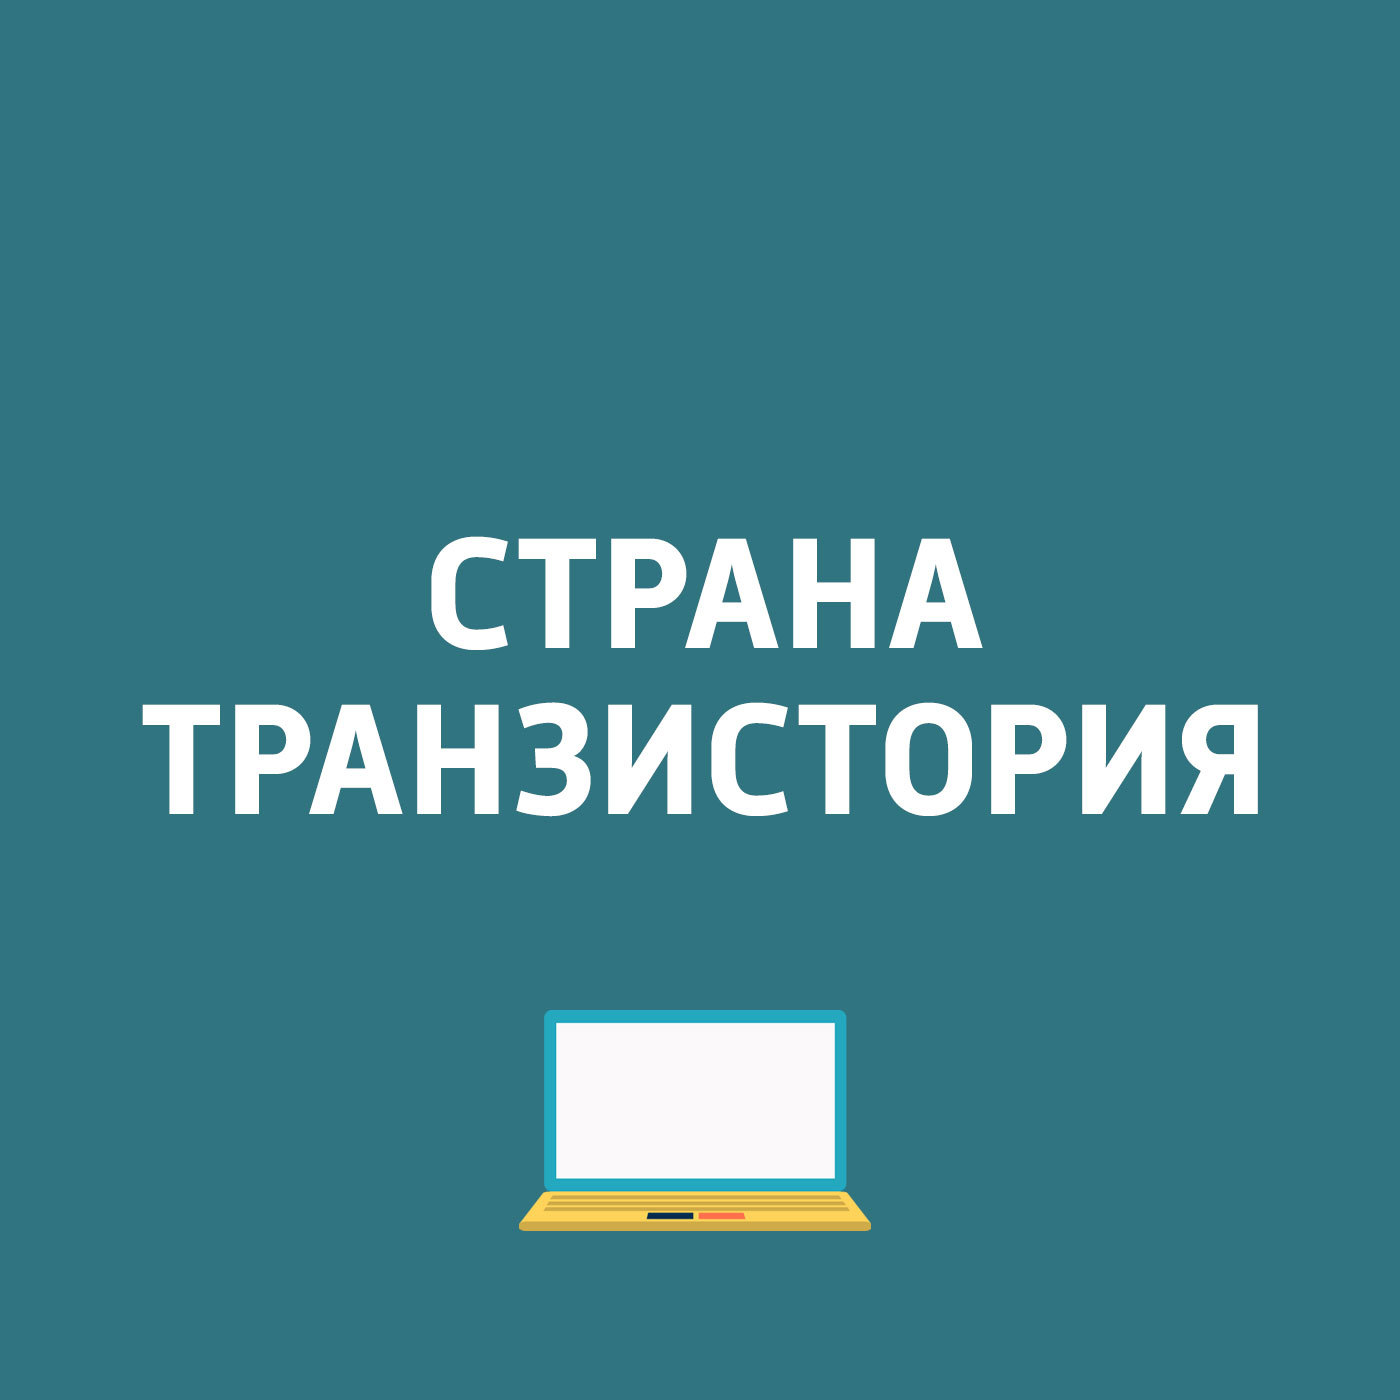 Картаев Павел Самые упоминаемые бренды Mobile World Congress